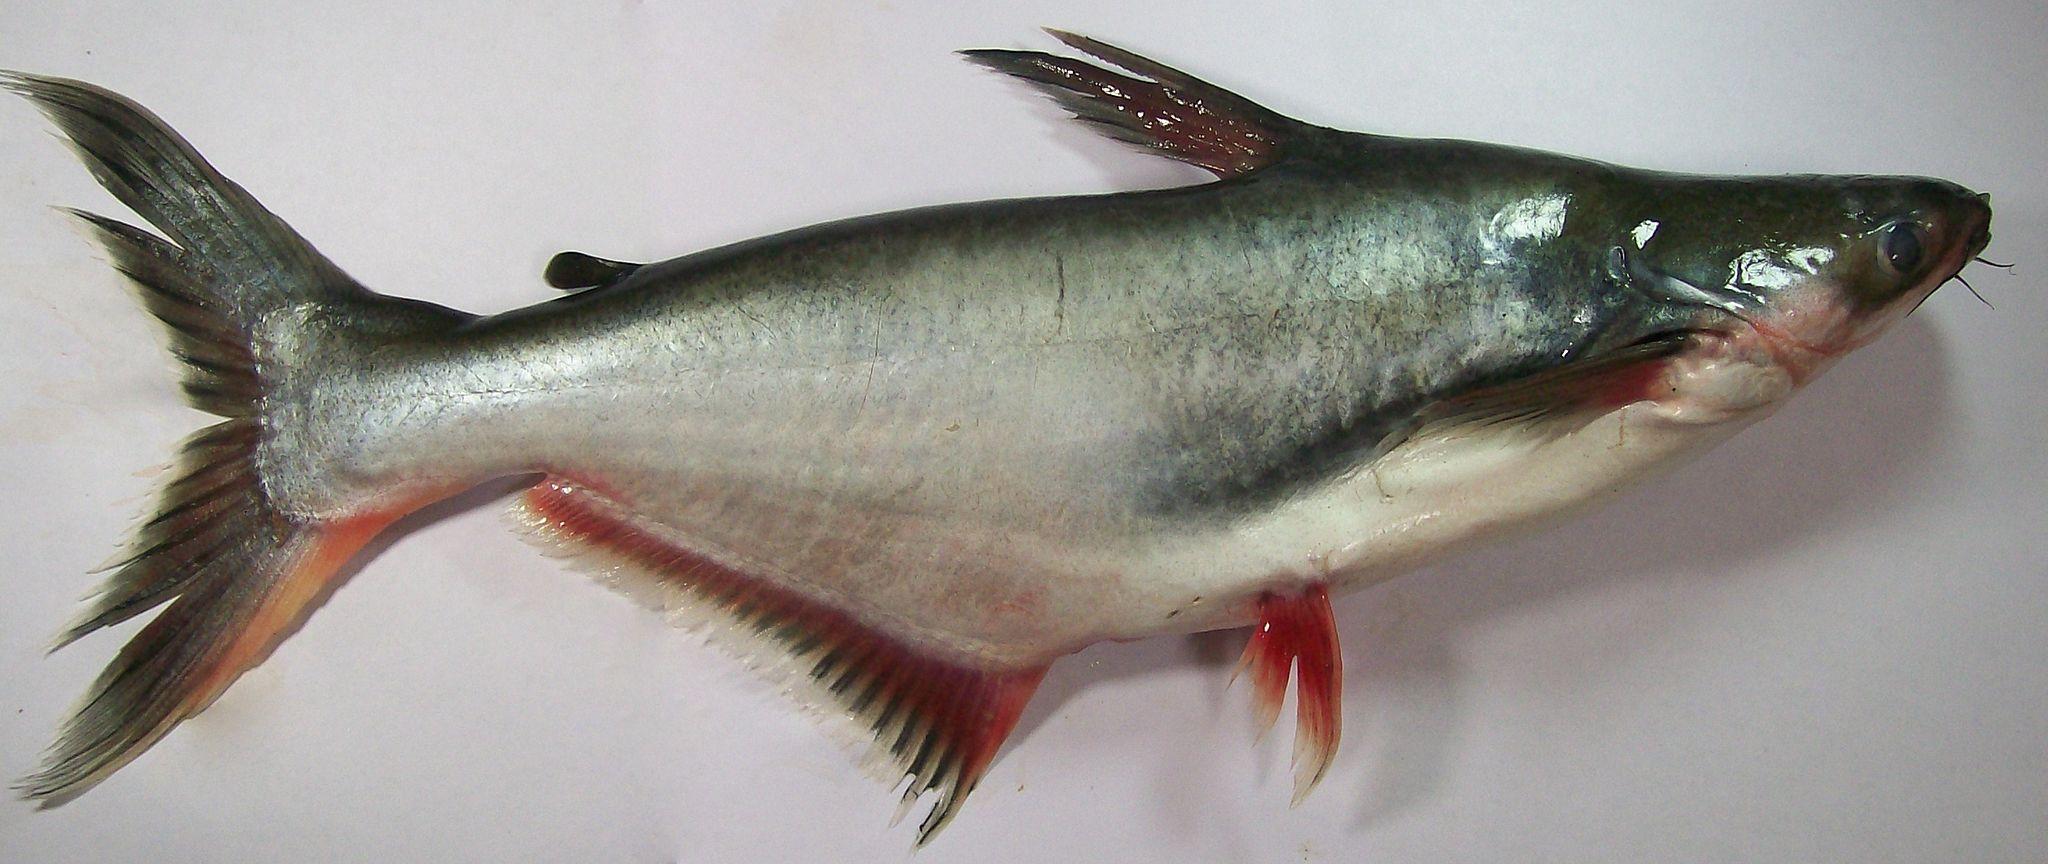 Pangasianodon hypophthalmus